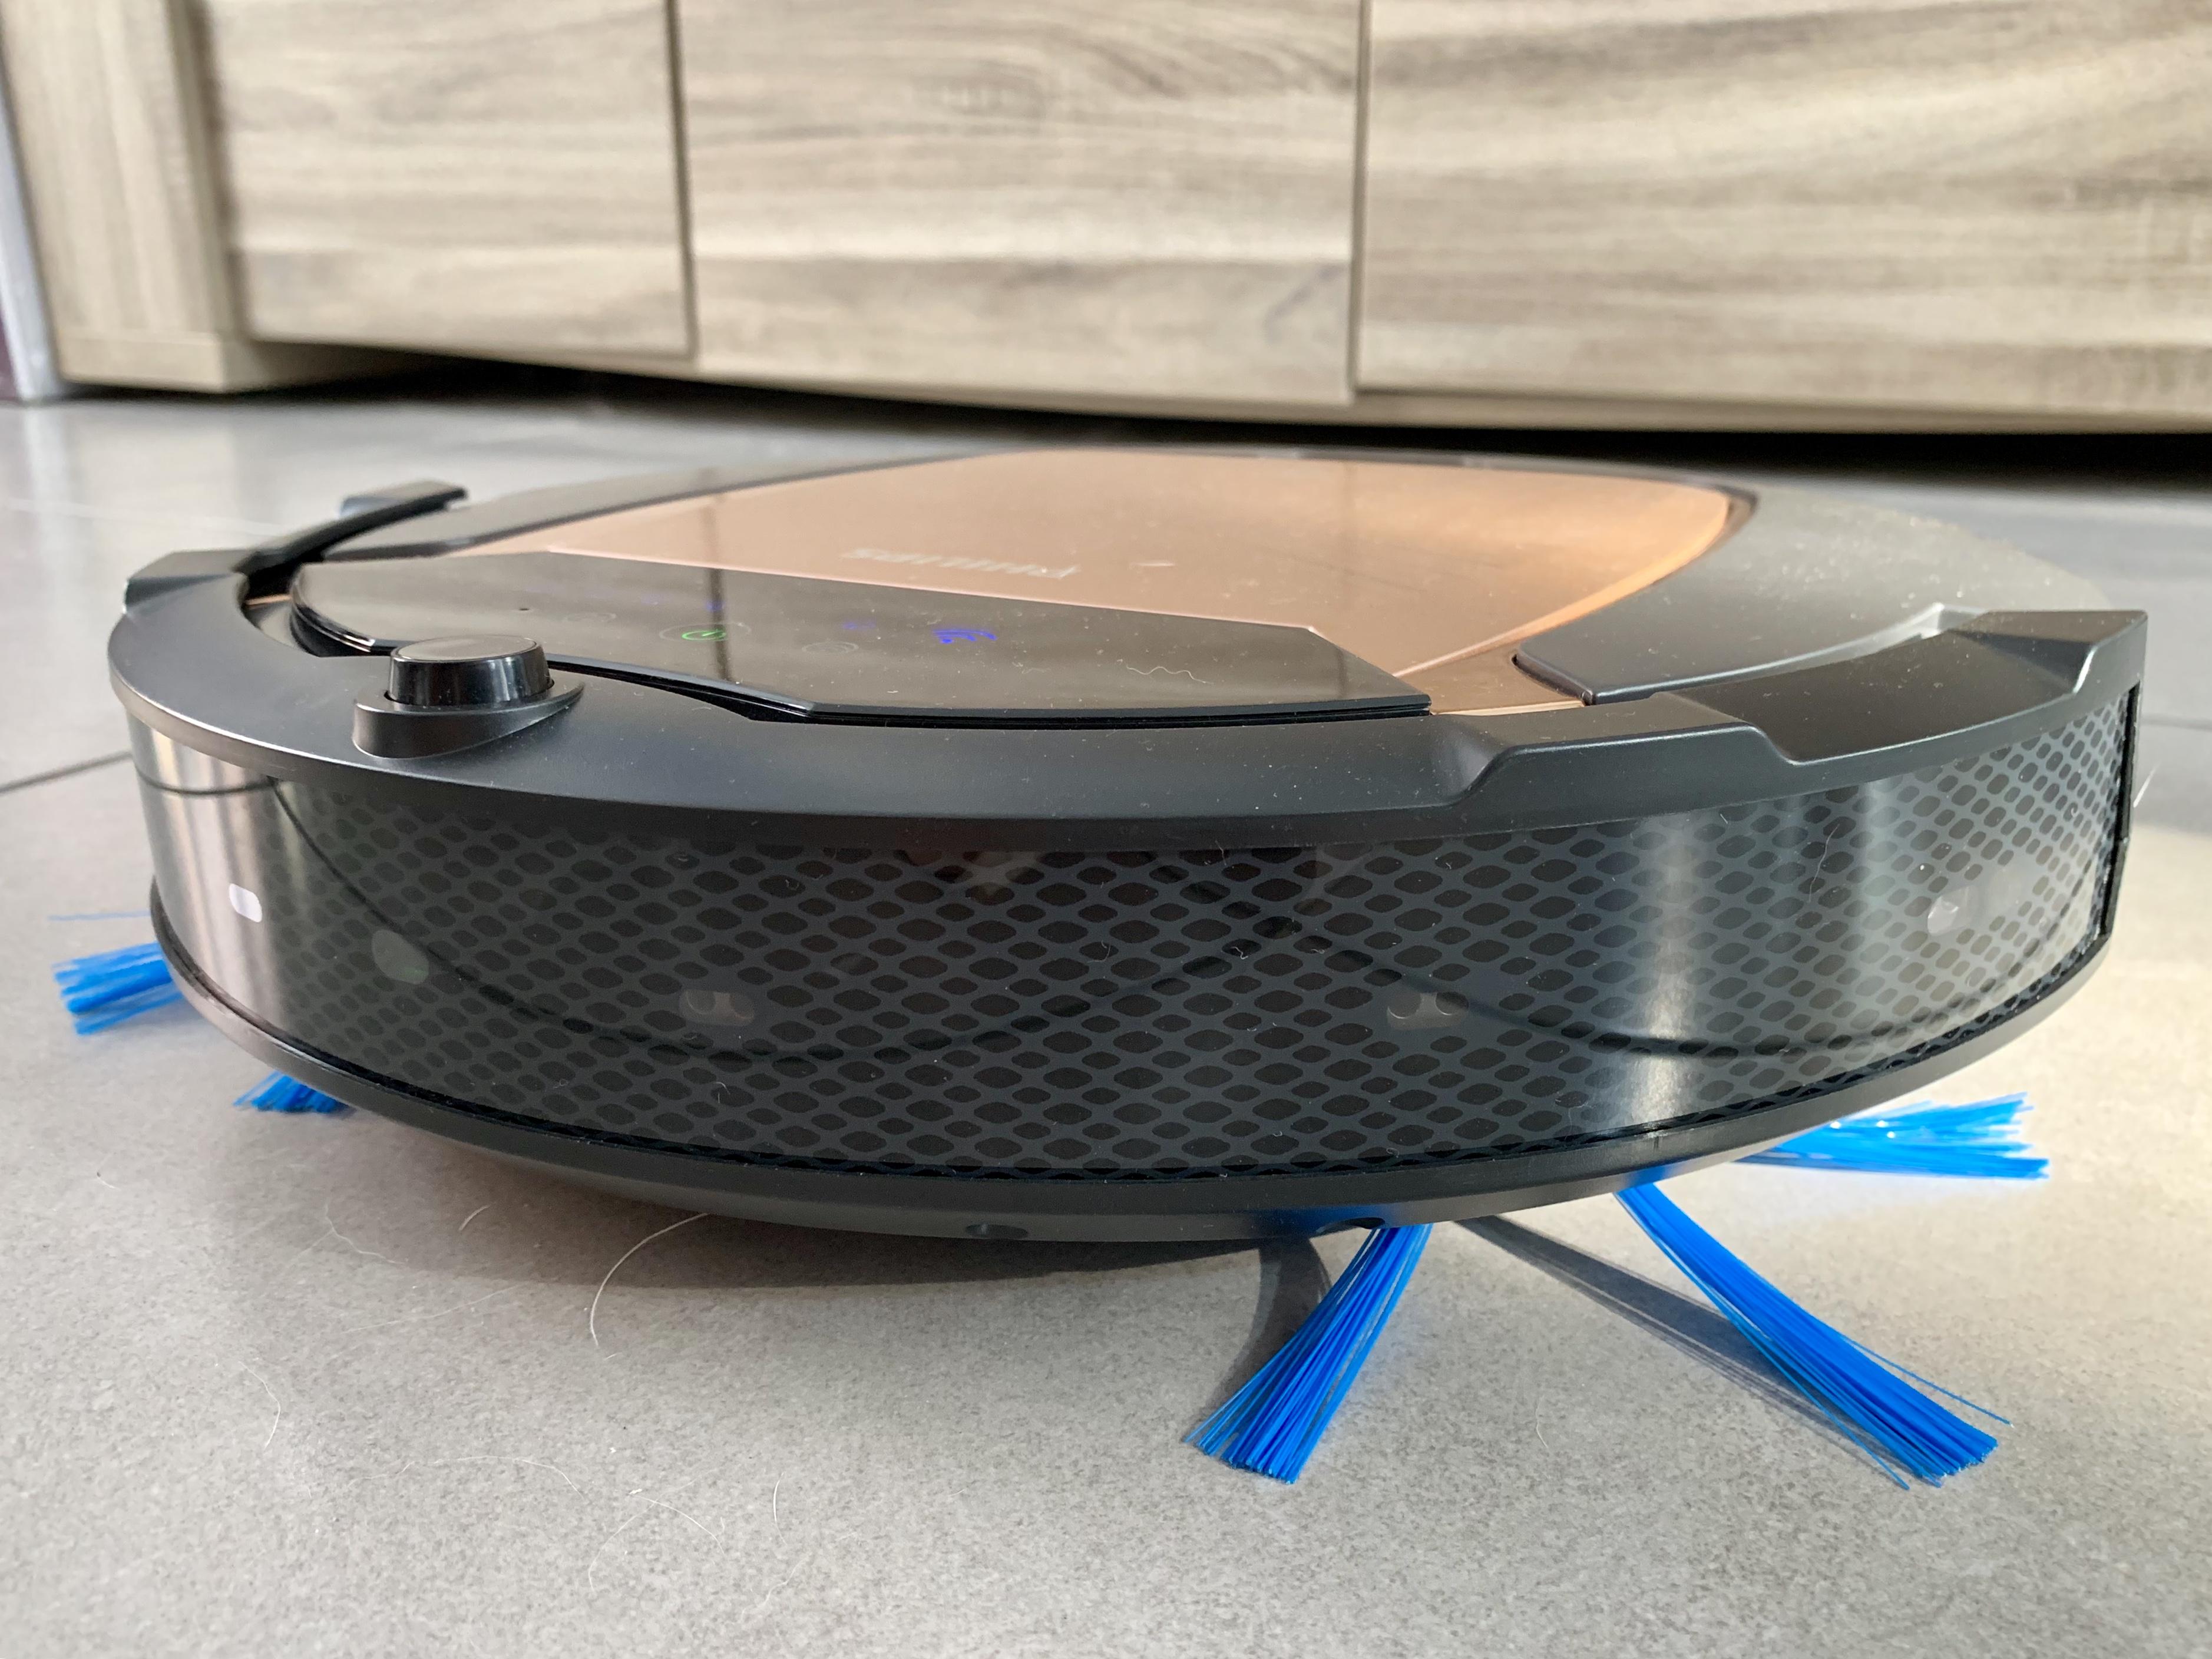 Aspirateur robot Philips SmartPro Active : service minimum